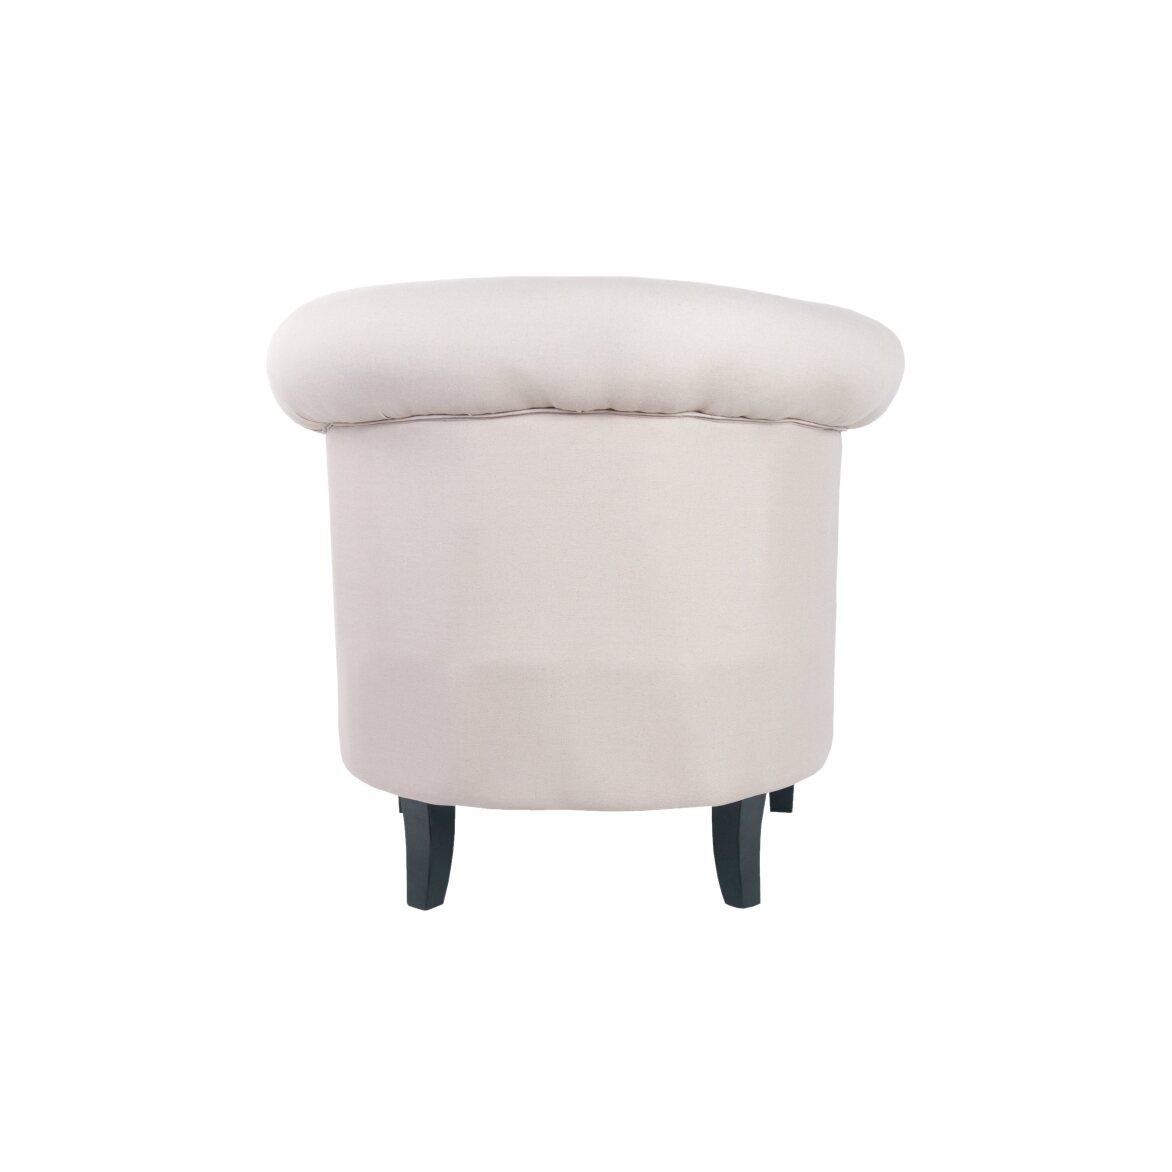 Кресло Swaun beige 3 | Маленькие кресла Kingsby